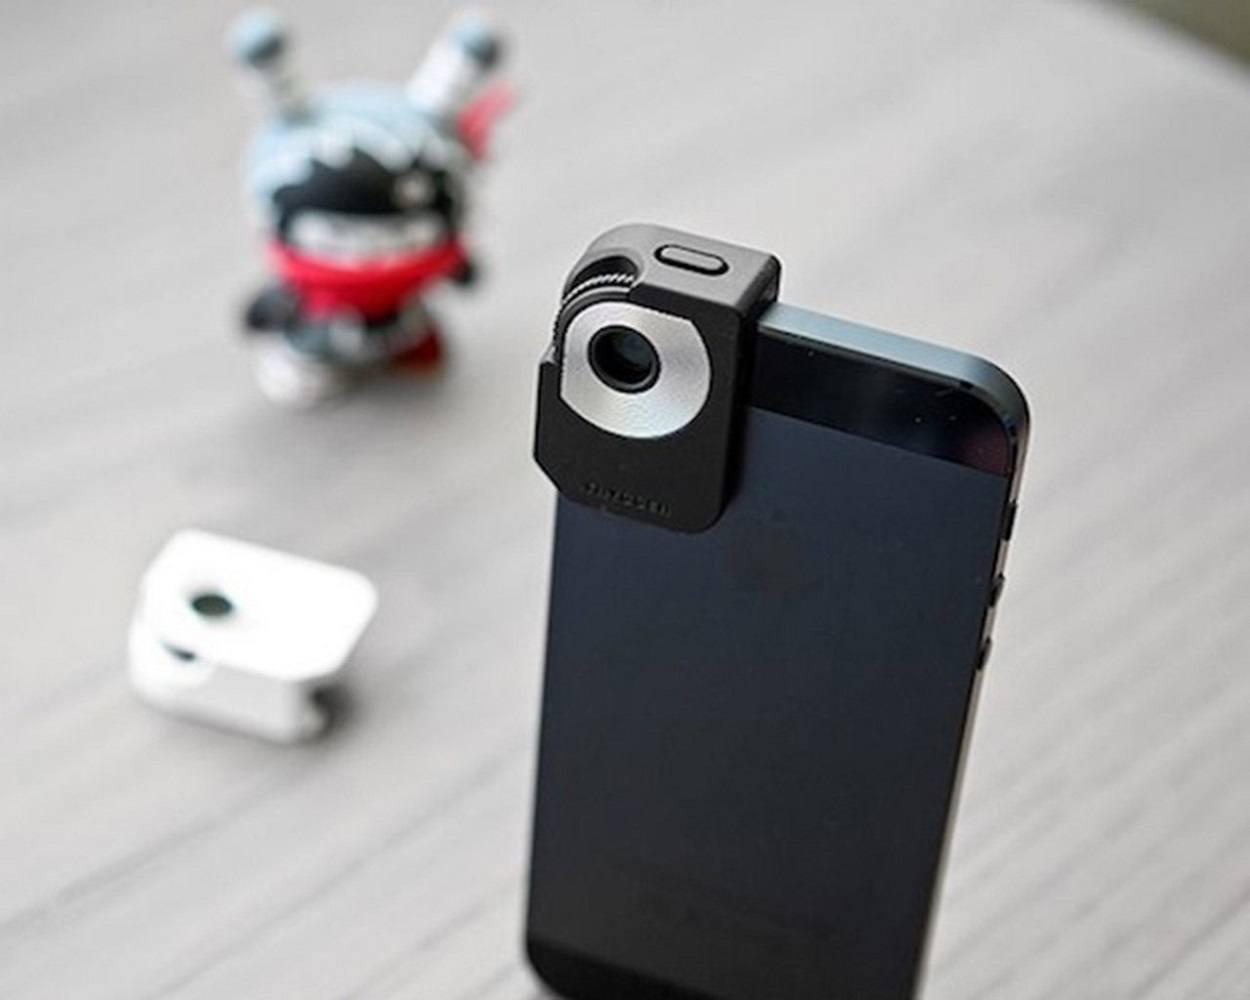 Trygger Clip-on iPhone SE/5s Polarizing Filter